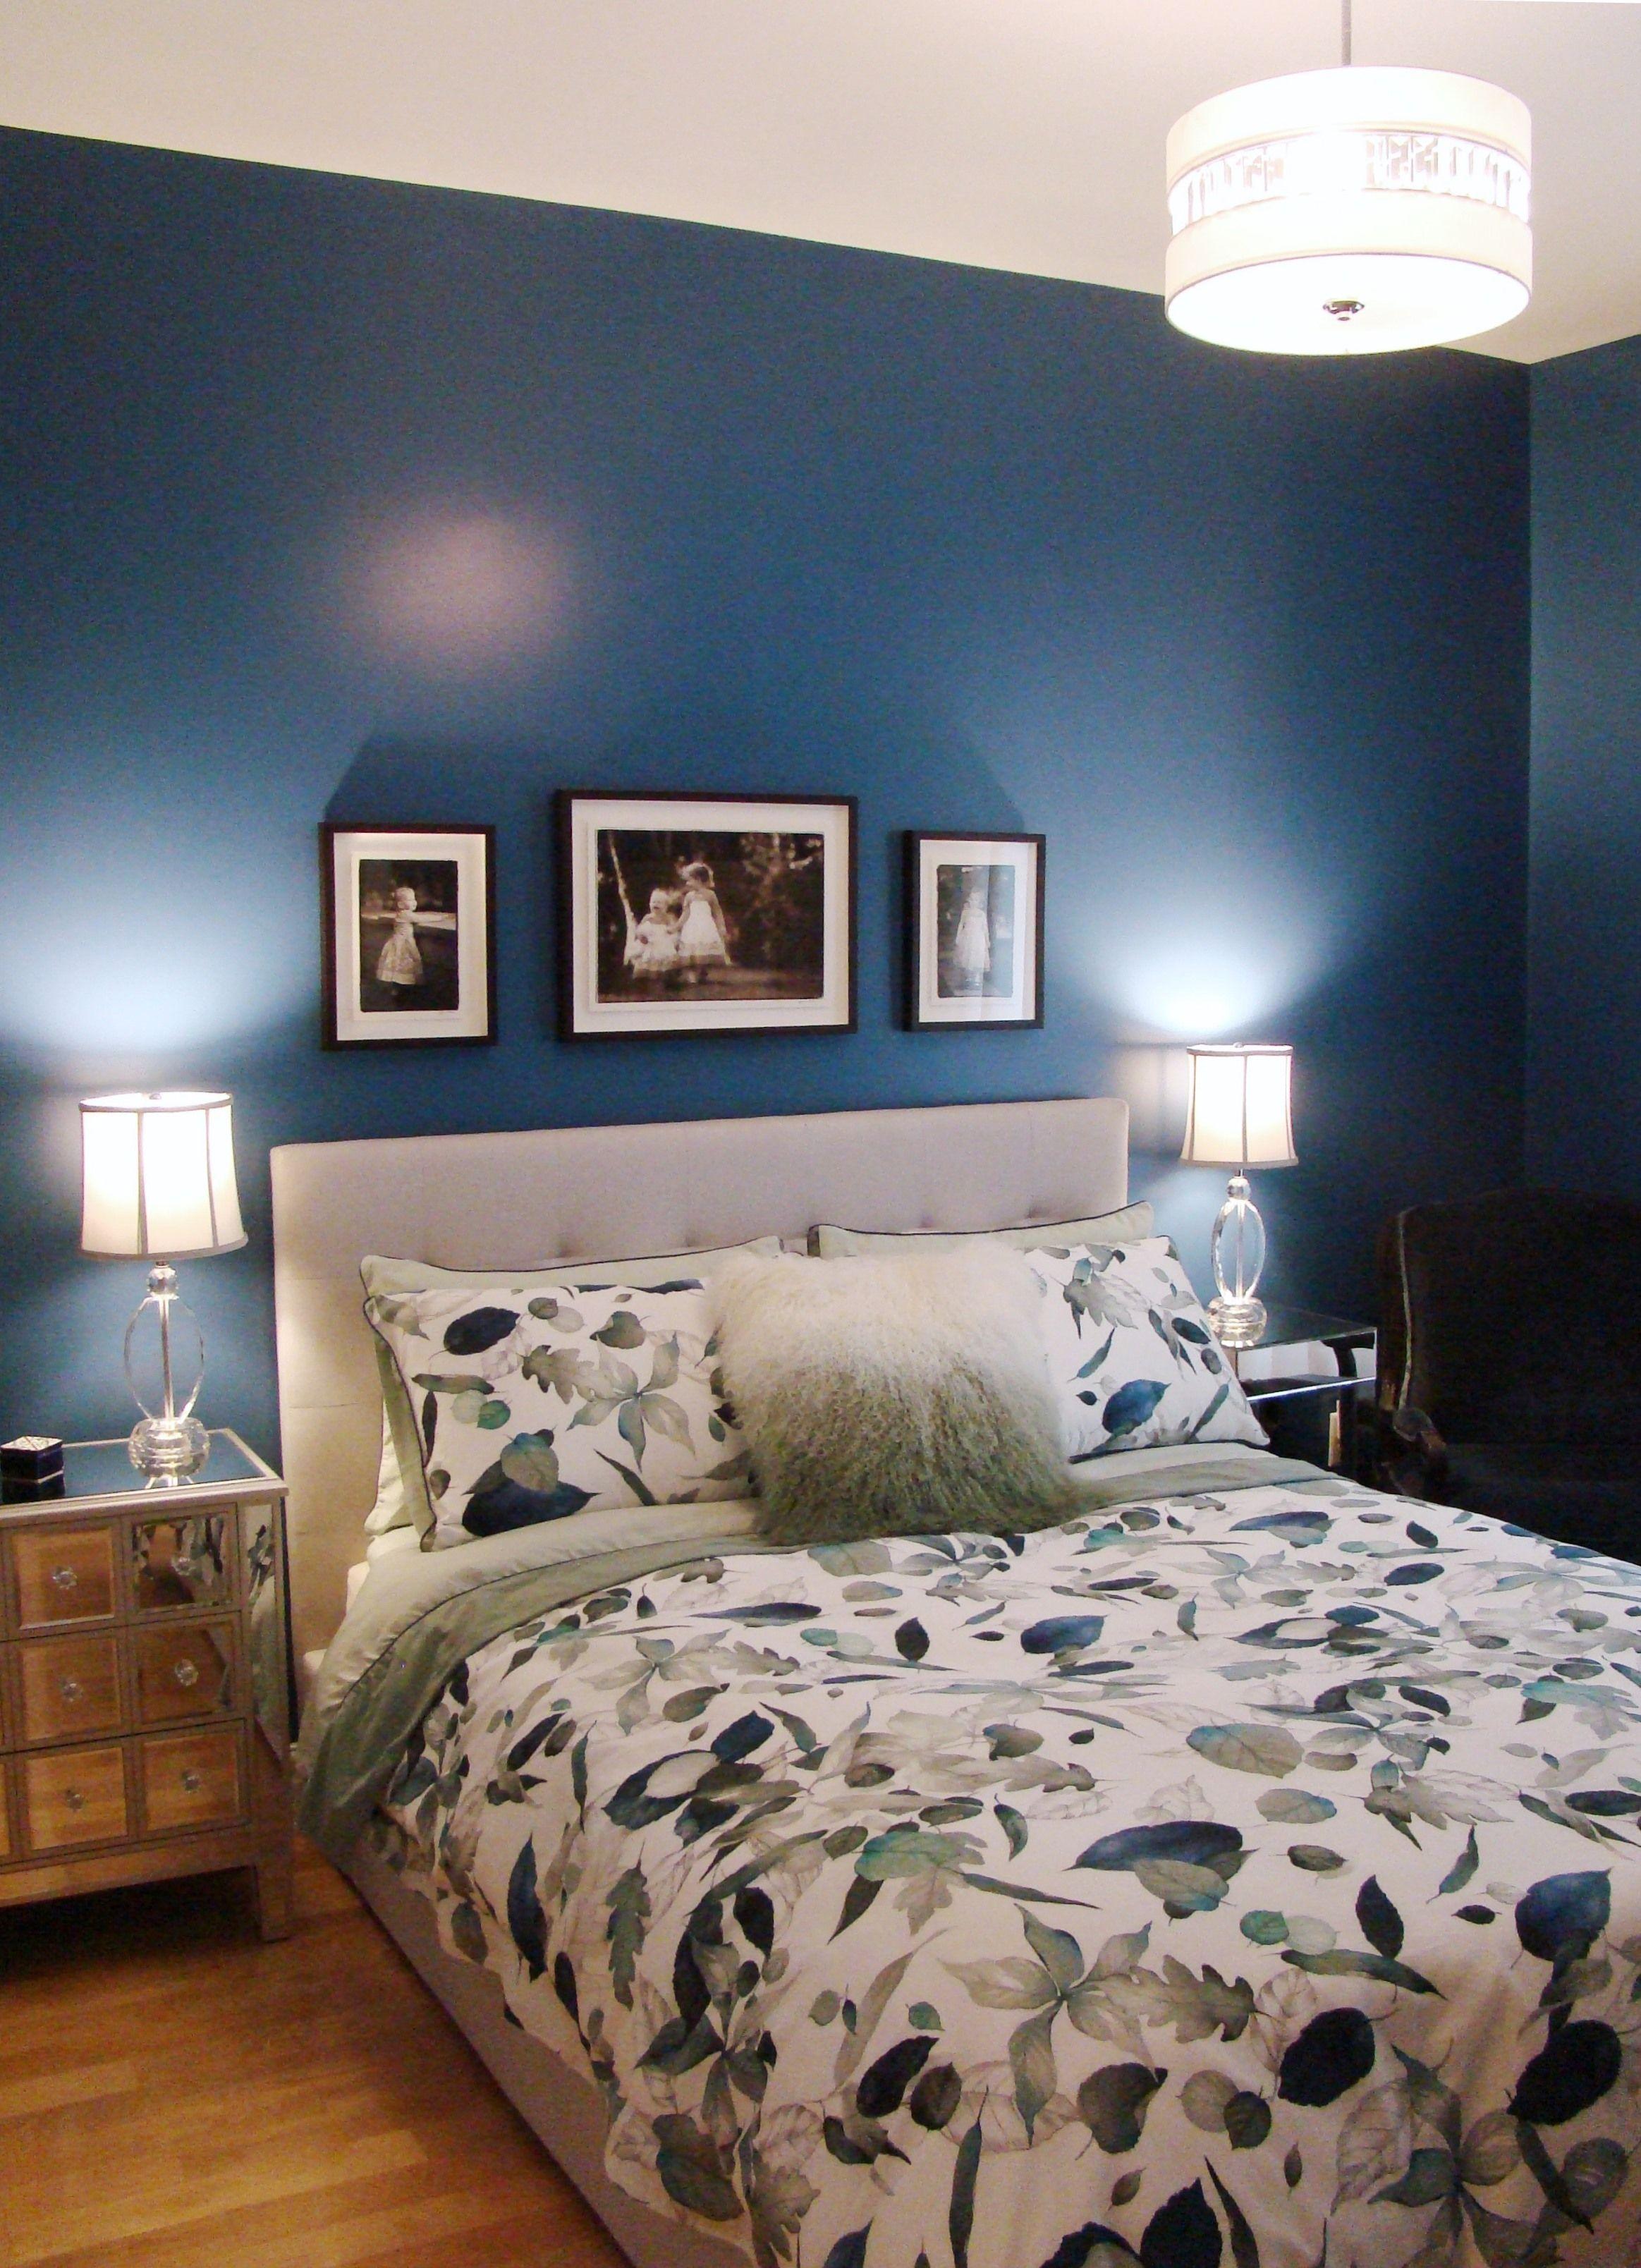 Interior Design Styles Small Spaces #homedecorblog